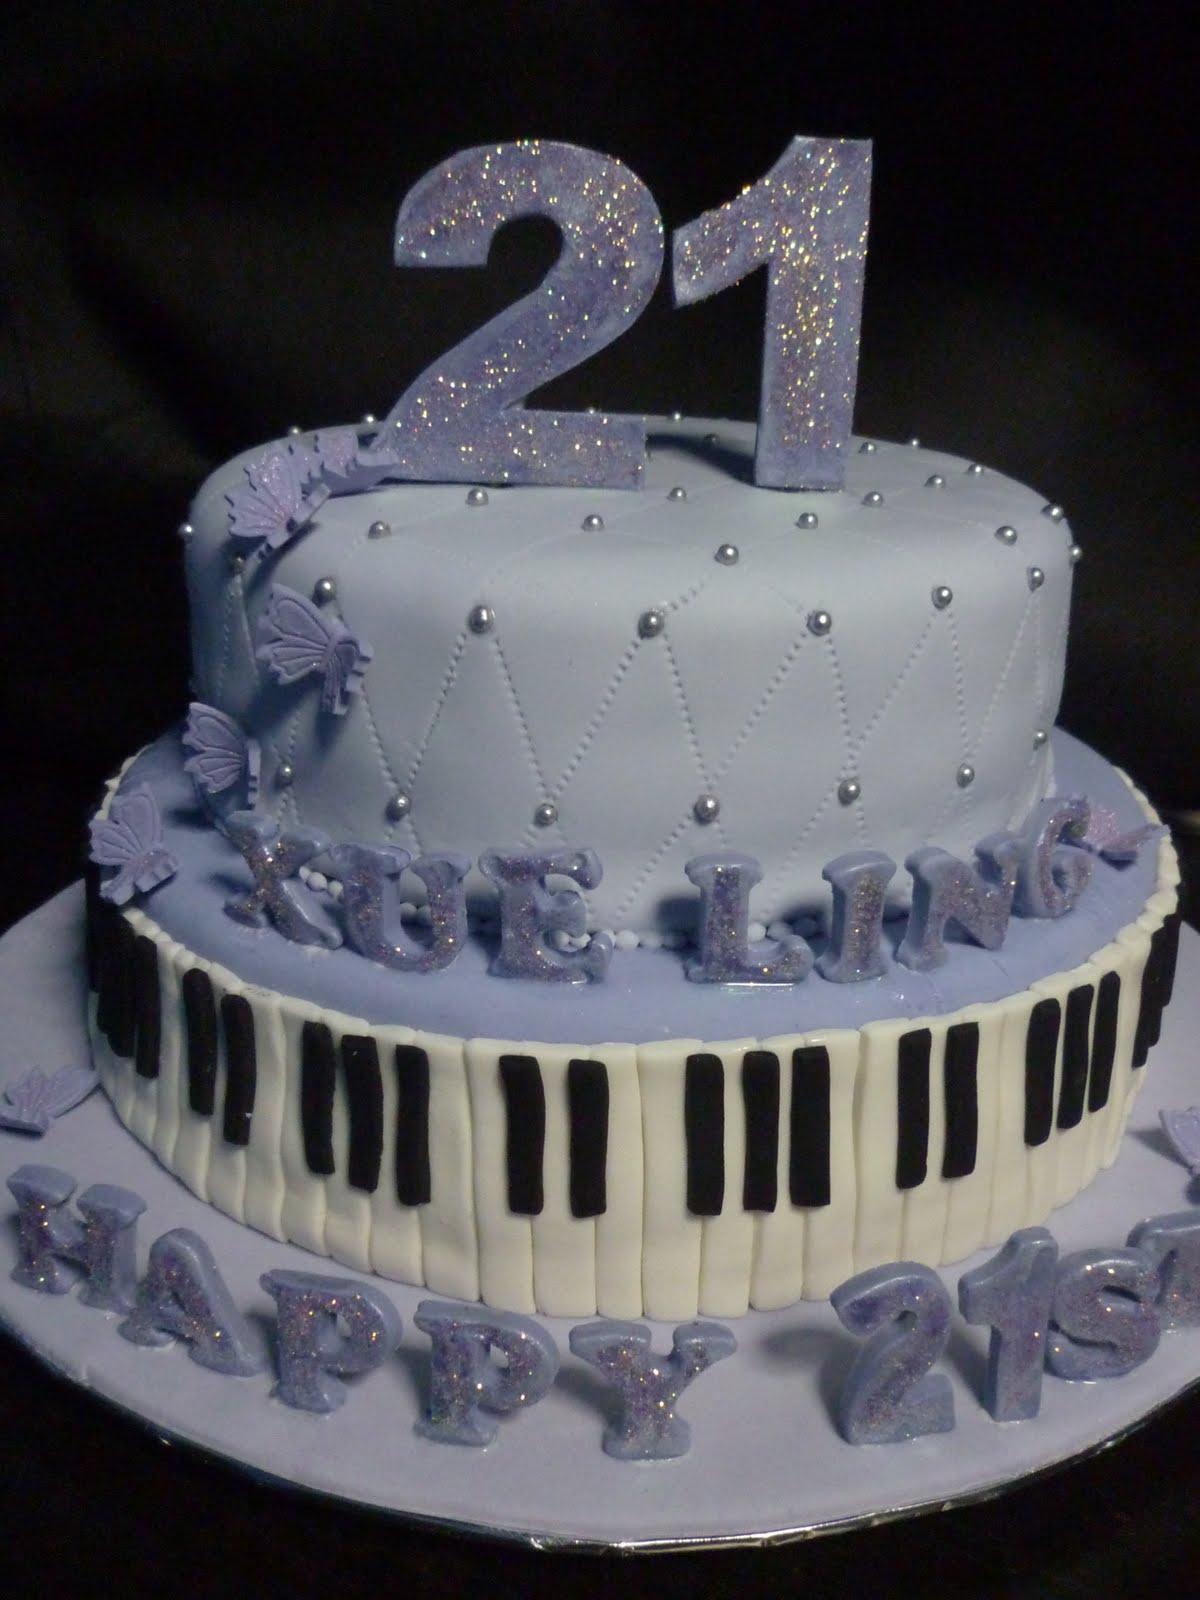 21st Birthday Cake Ideas For Guys